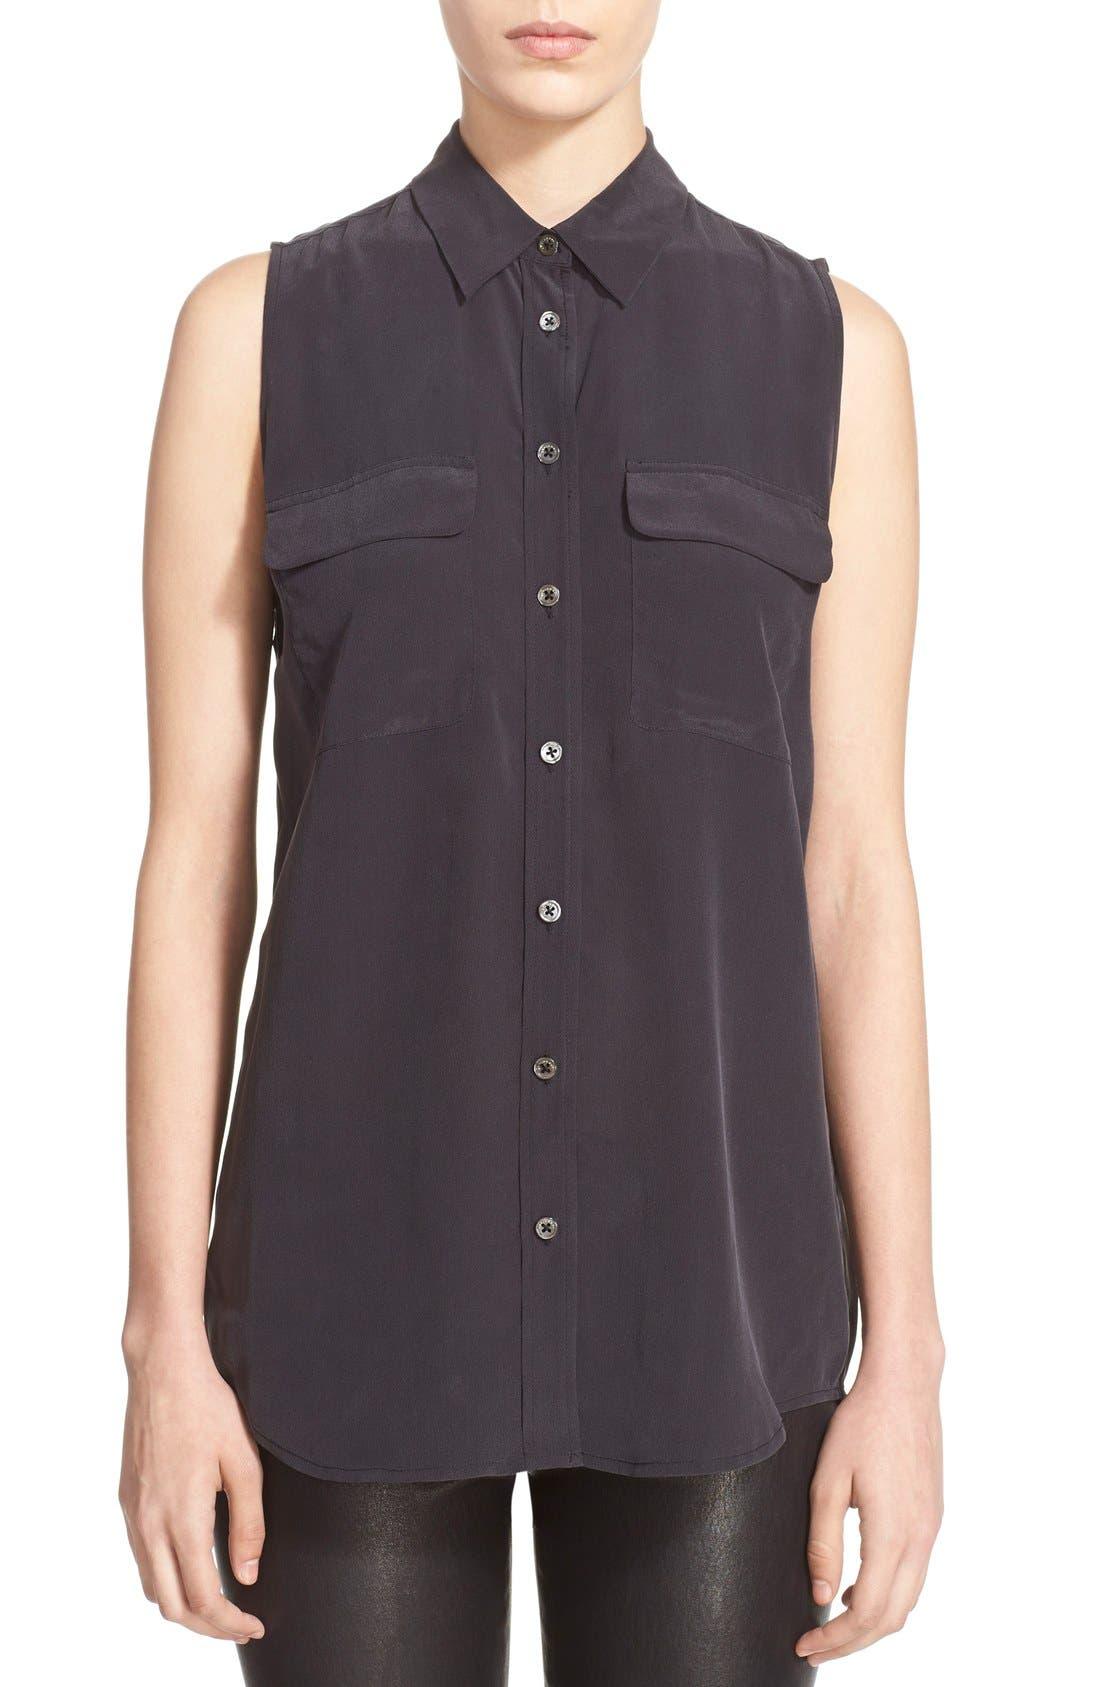 Alternate Image 1 Selected - Equipment 'Slim Signature' Sleeveless Silk Shirt